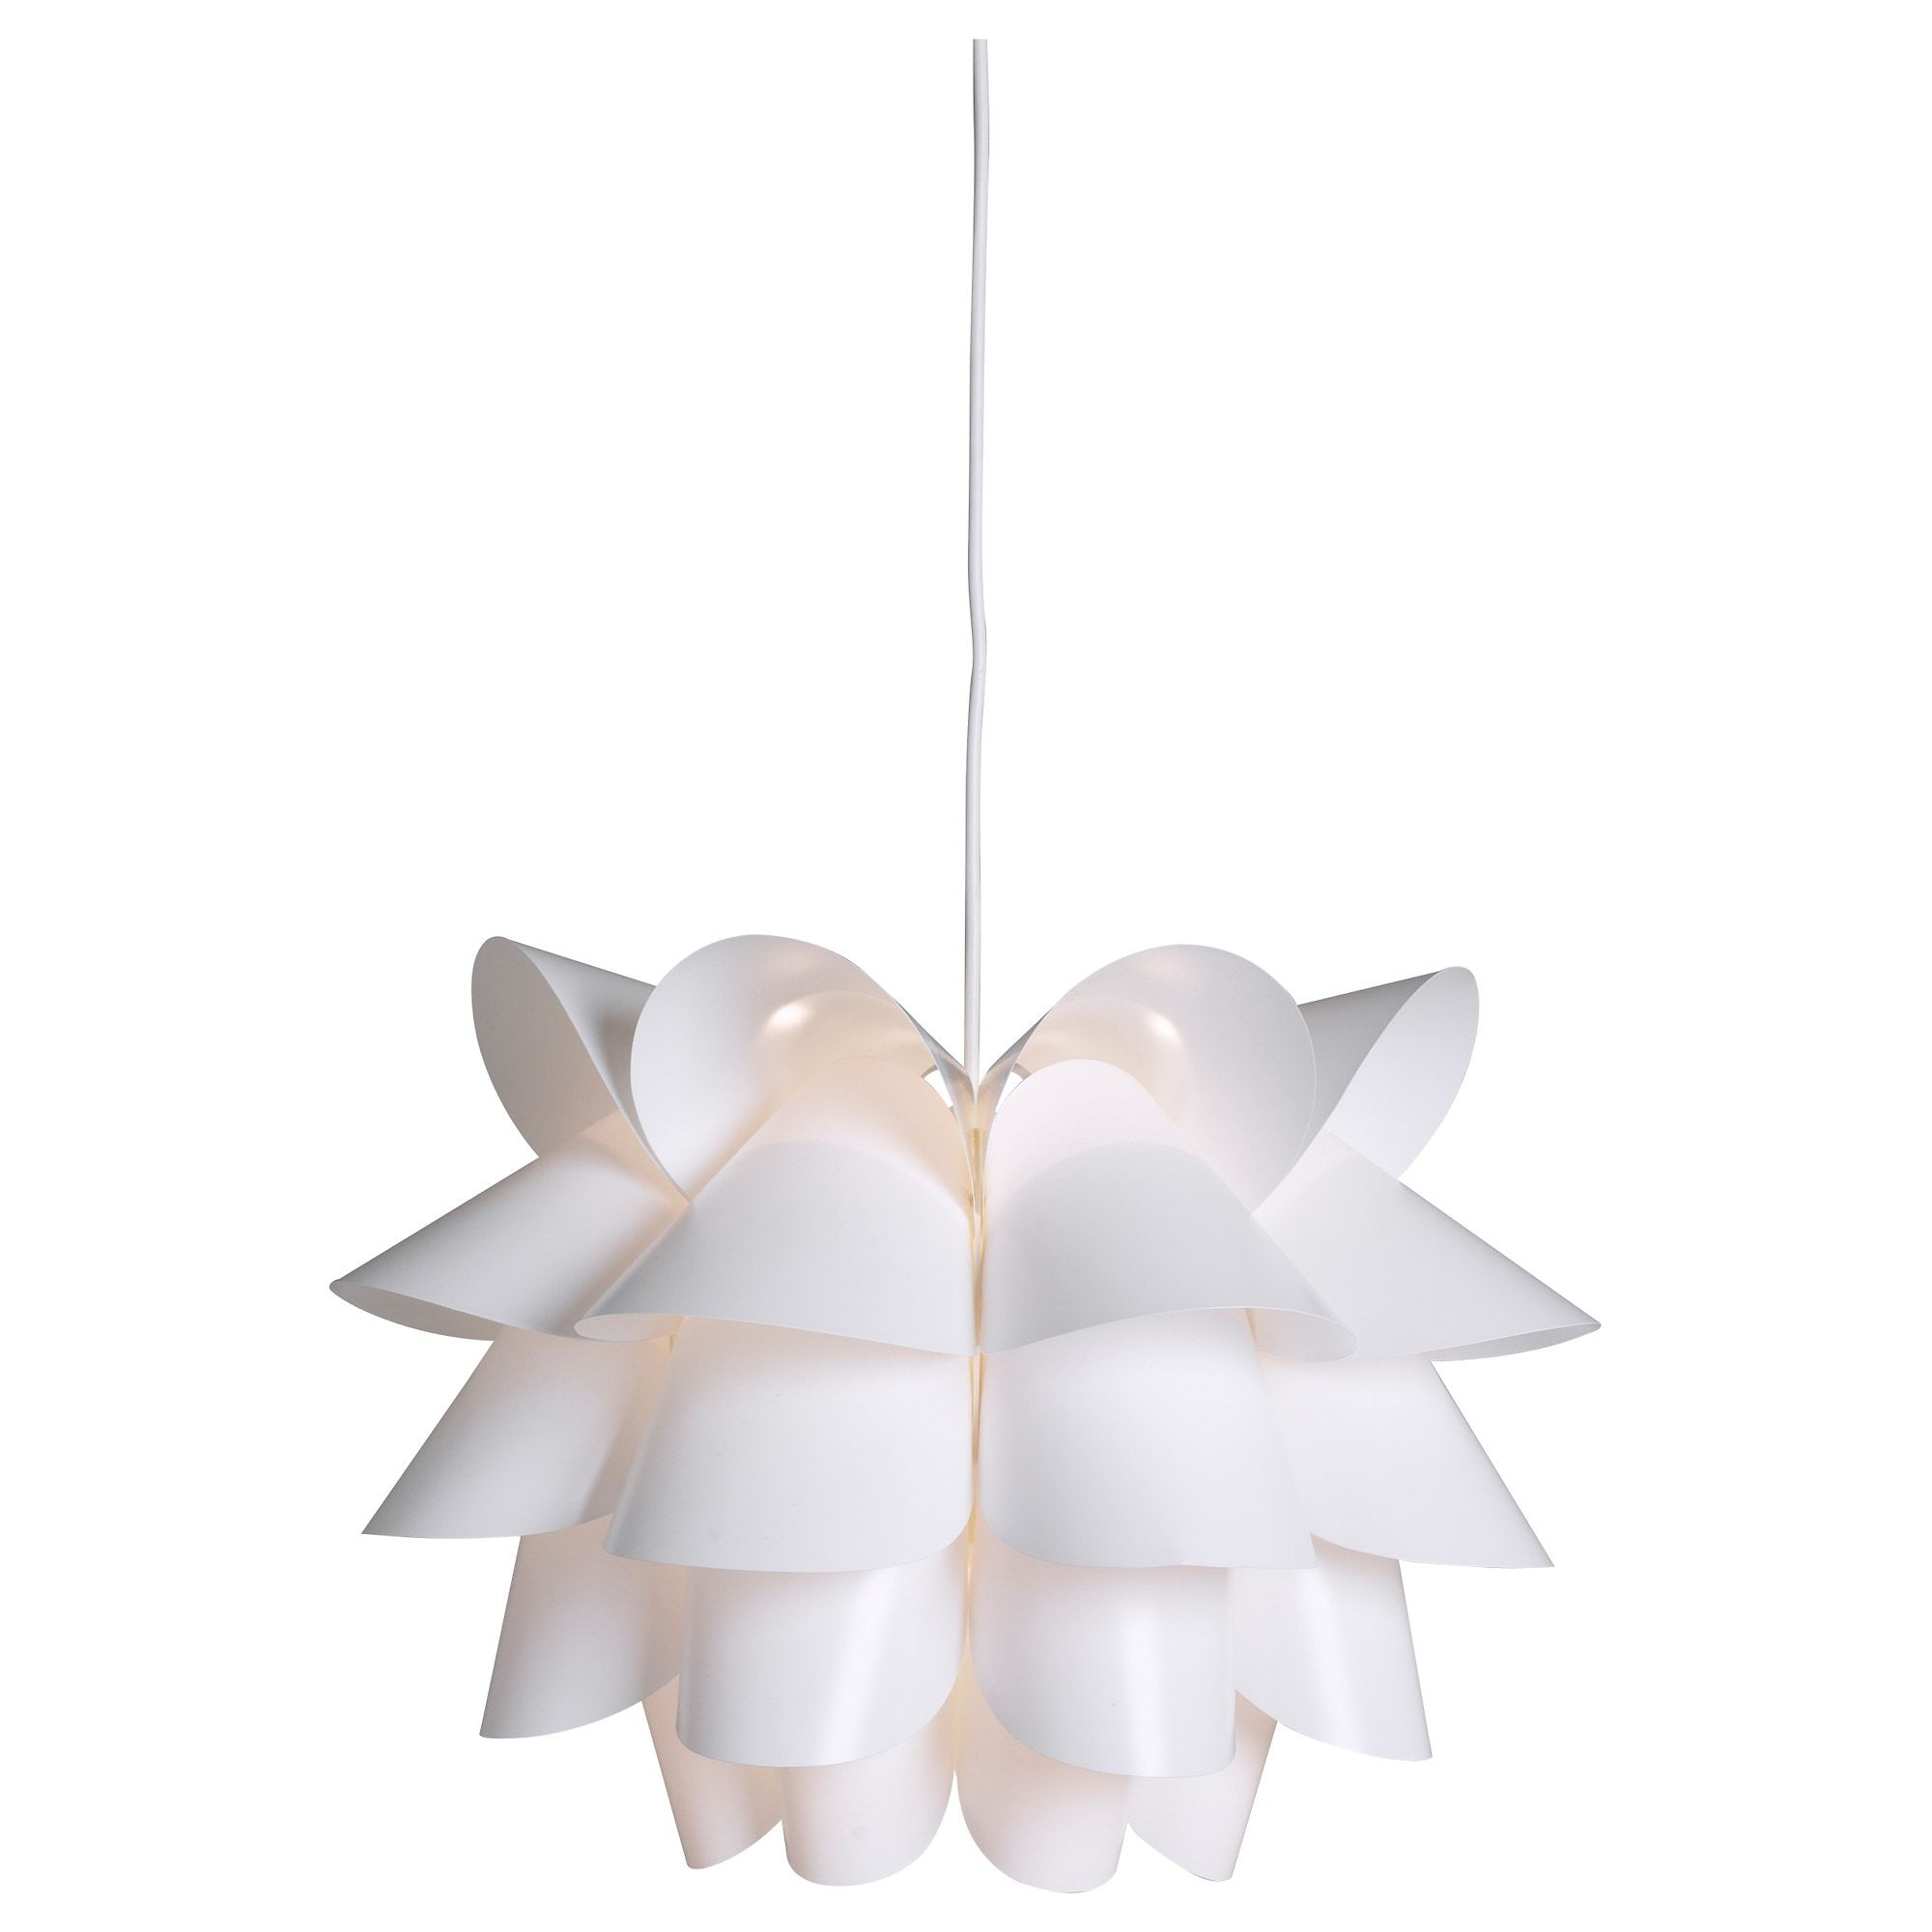 Gothem Jakobsbyn Pendant Lamp Dark Gray Smoked 12 Pendant Lamp Pendant Lamp Shade Lamp